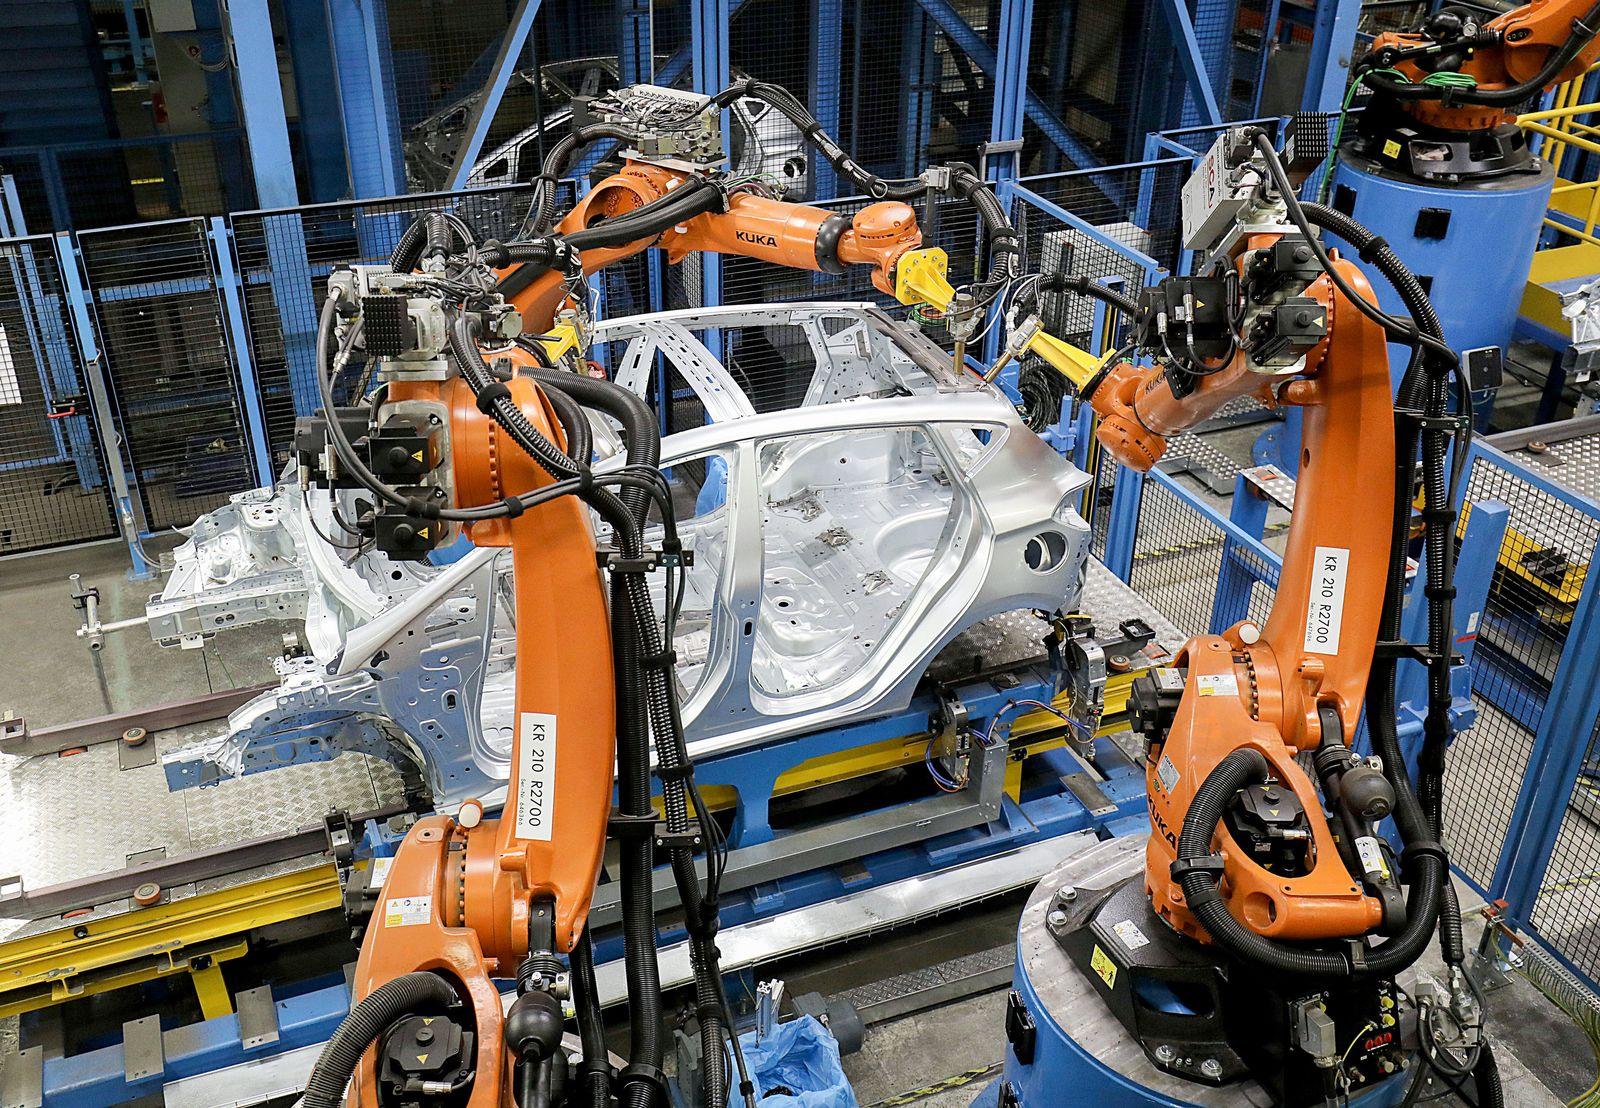 Kuka - Produktion bei Ford